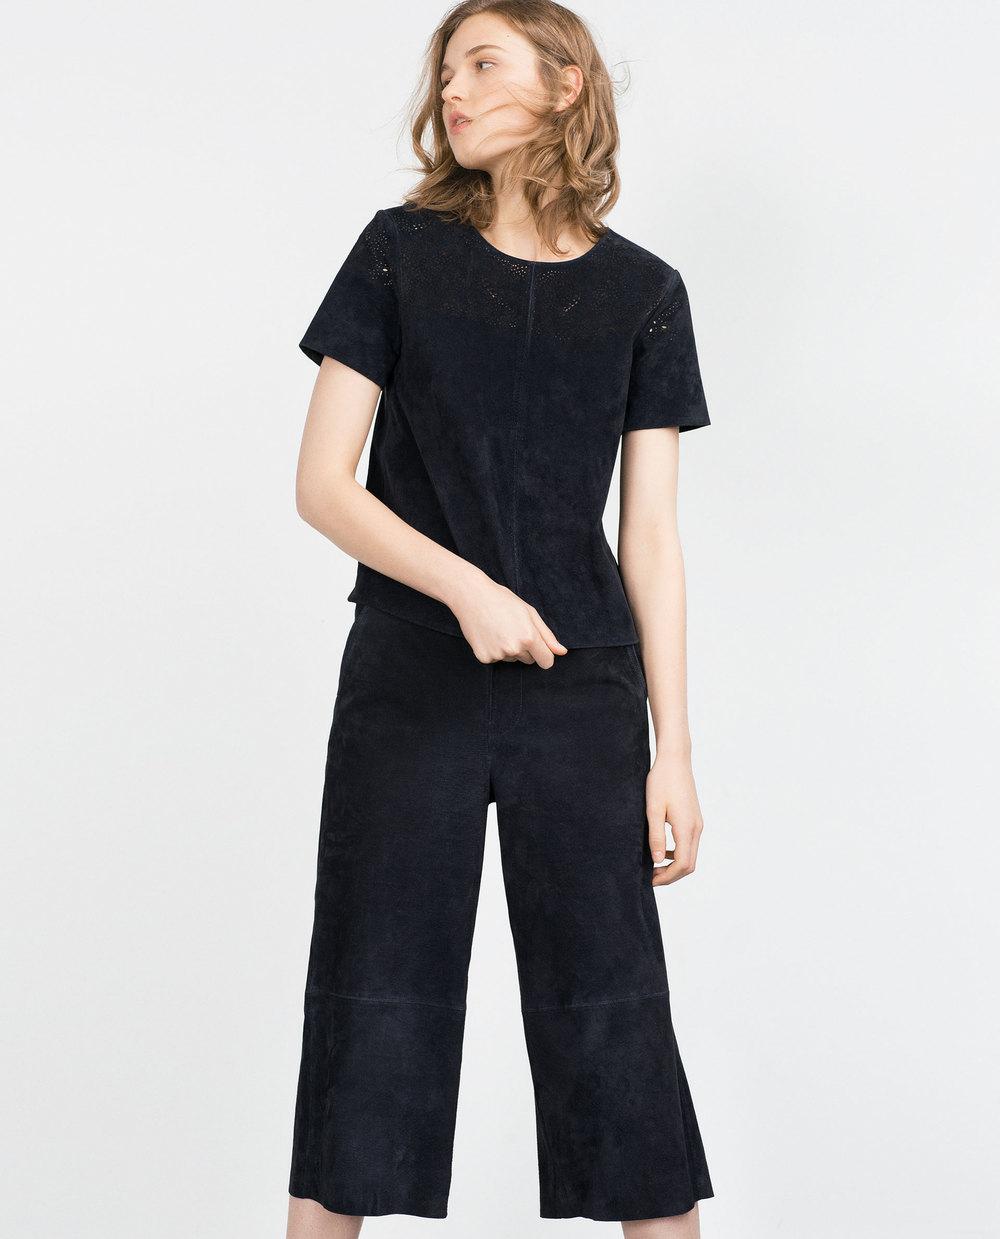 Suede culottes. Zara. $129.